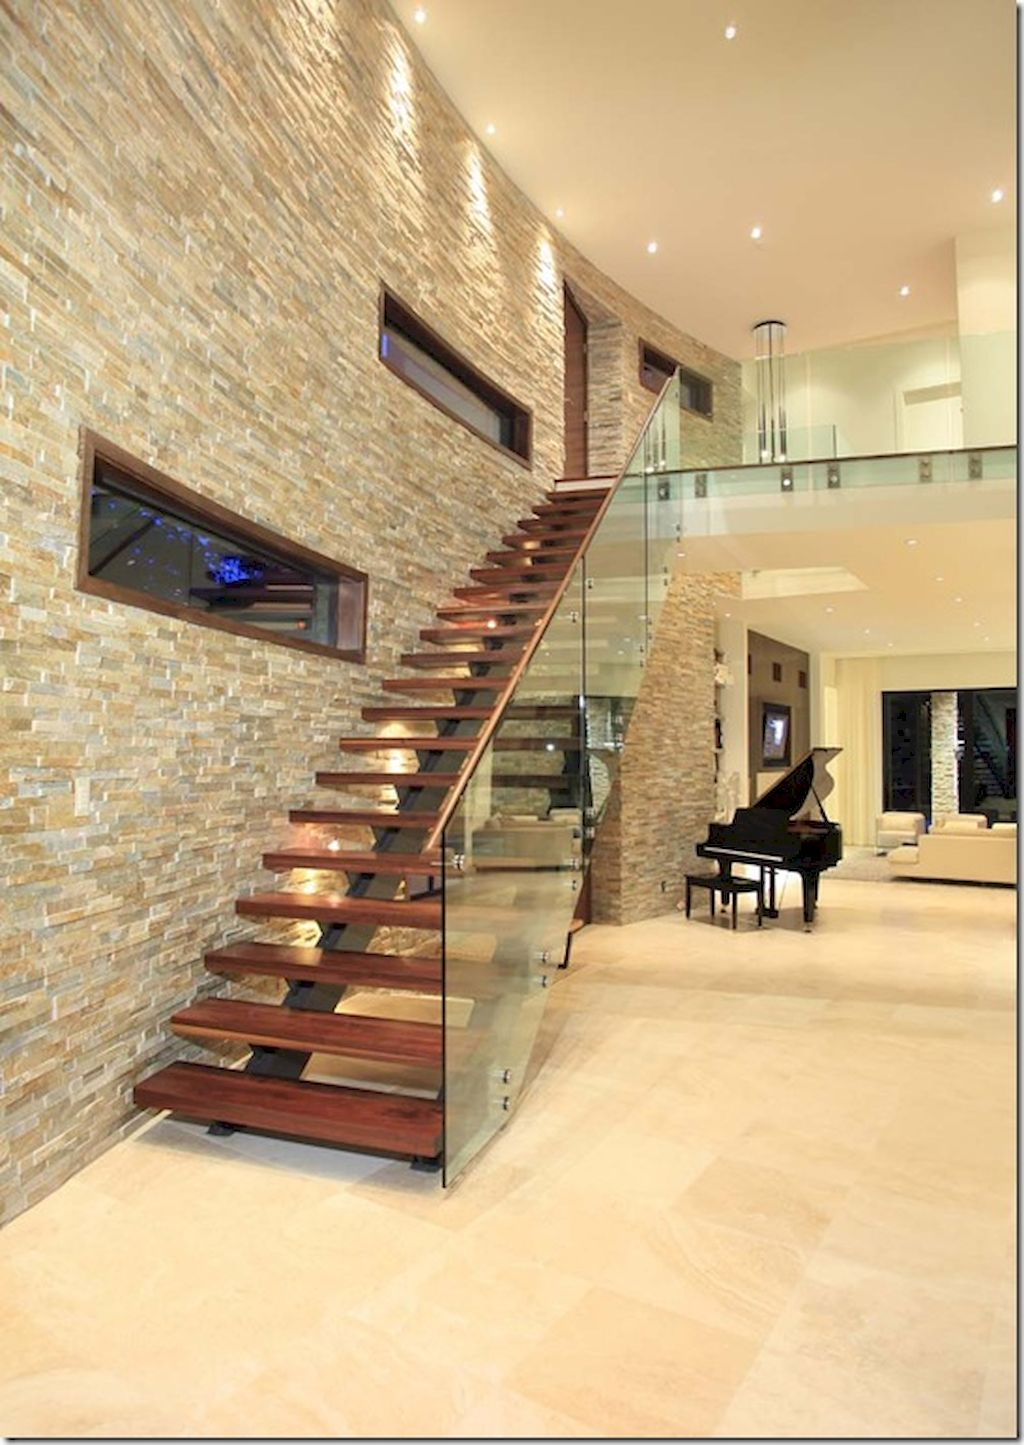 65 Interesting Stone Veneer Wall Design Ideas | Stone veneer, Stone ...